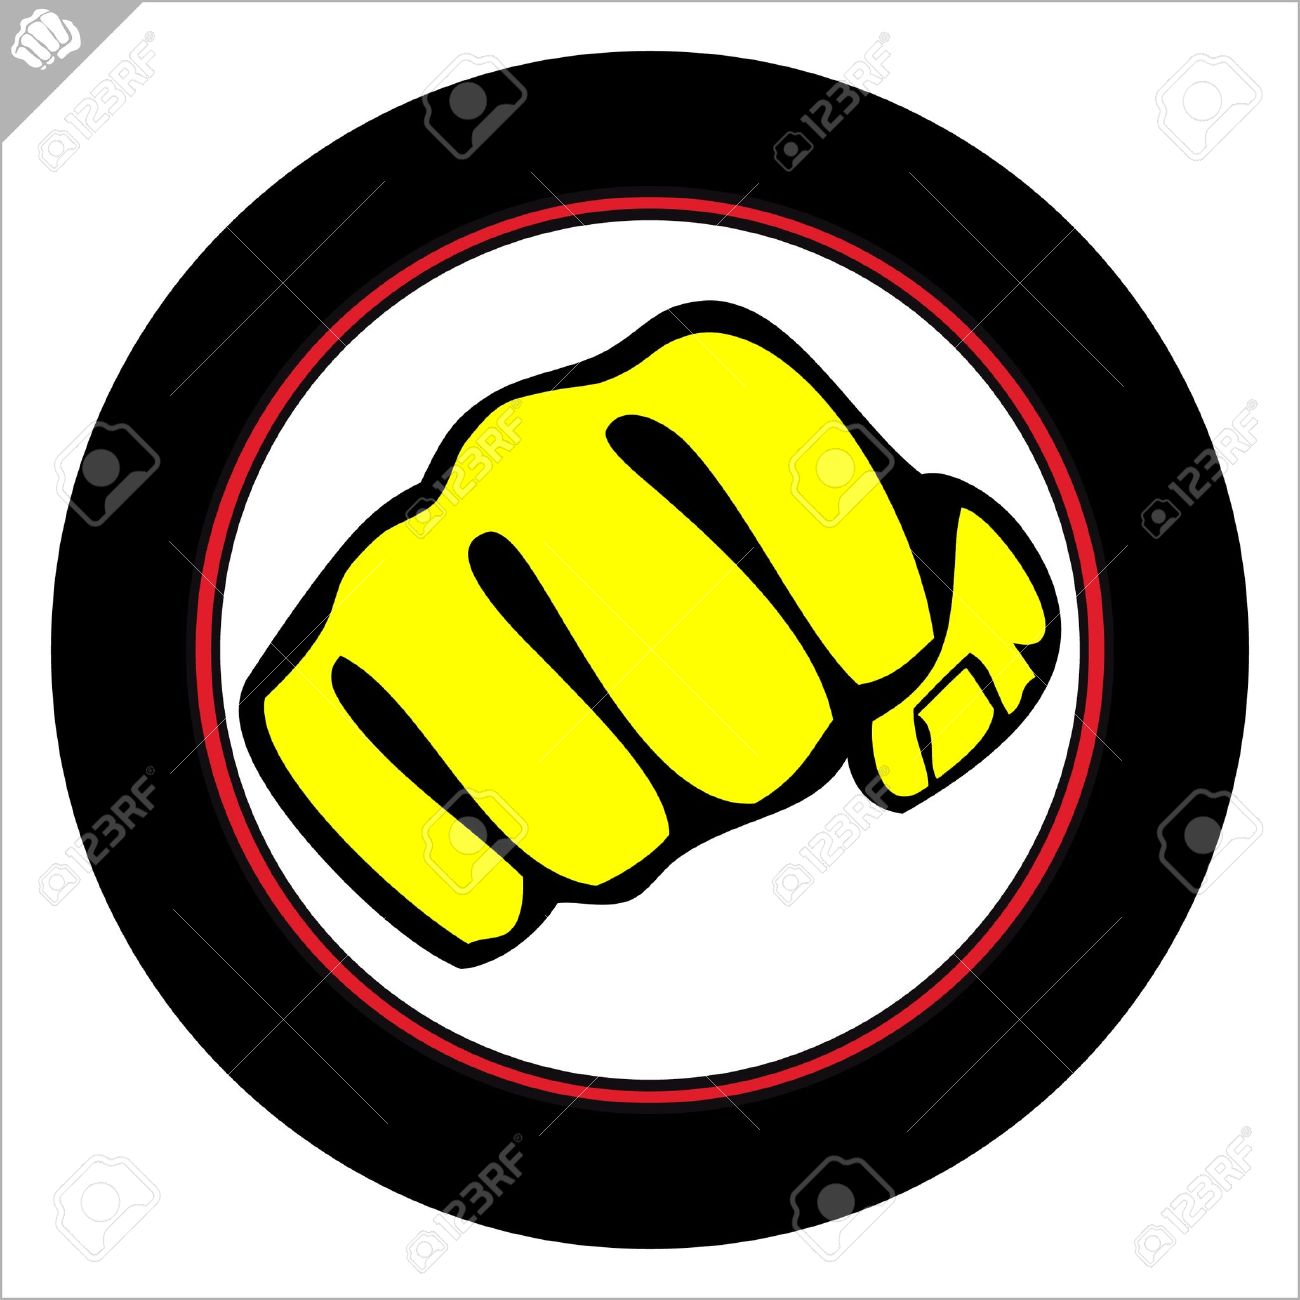 1300x1300 Fist Poster. Martial Arts Colored Emblem, Symbol. Karate Style